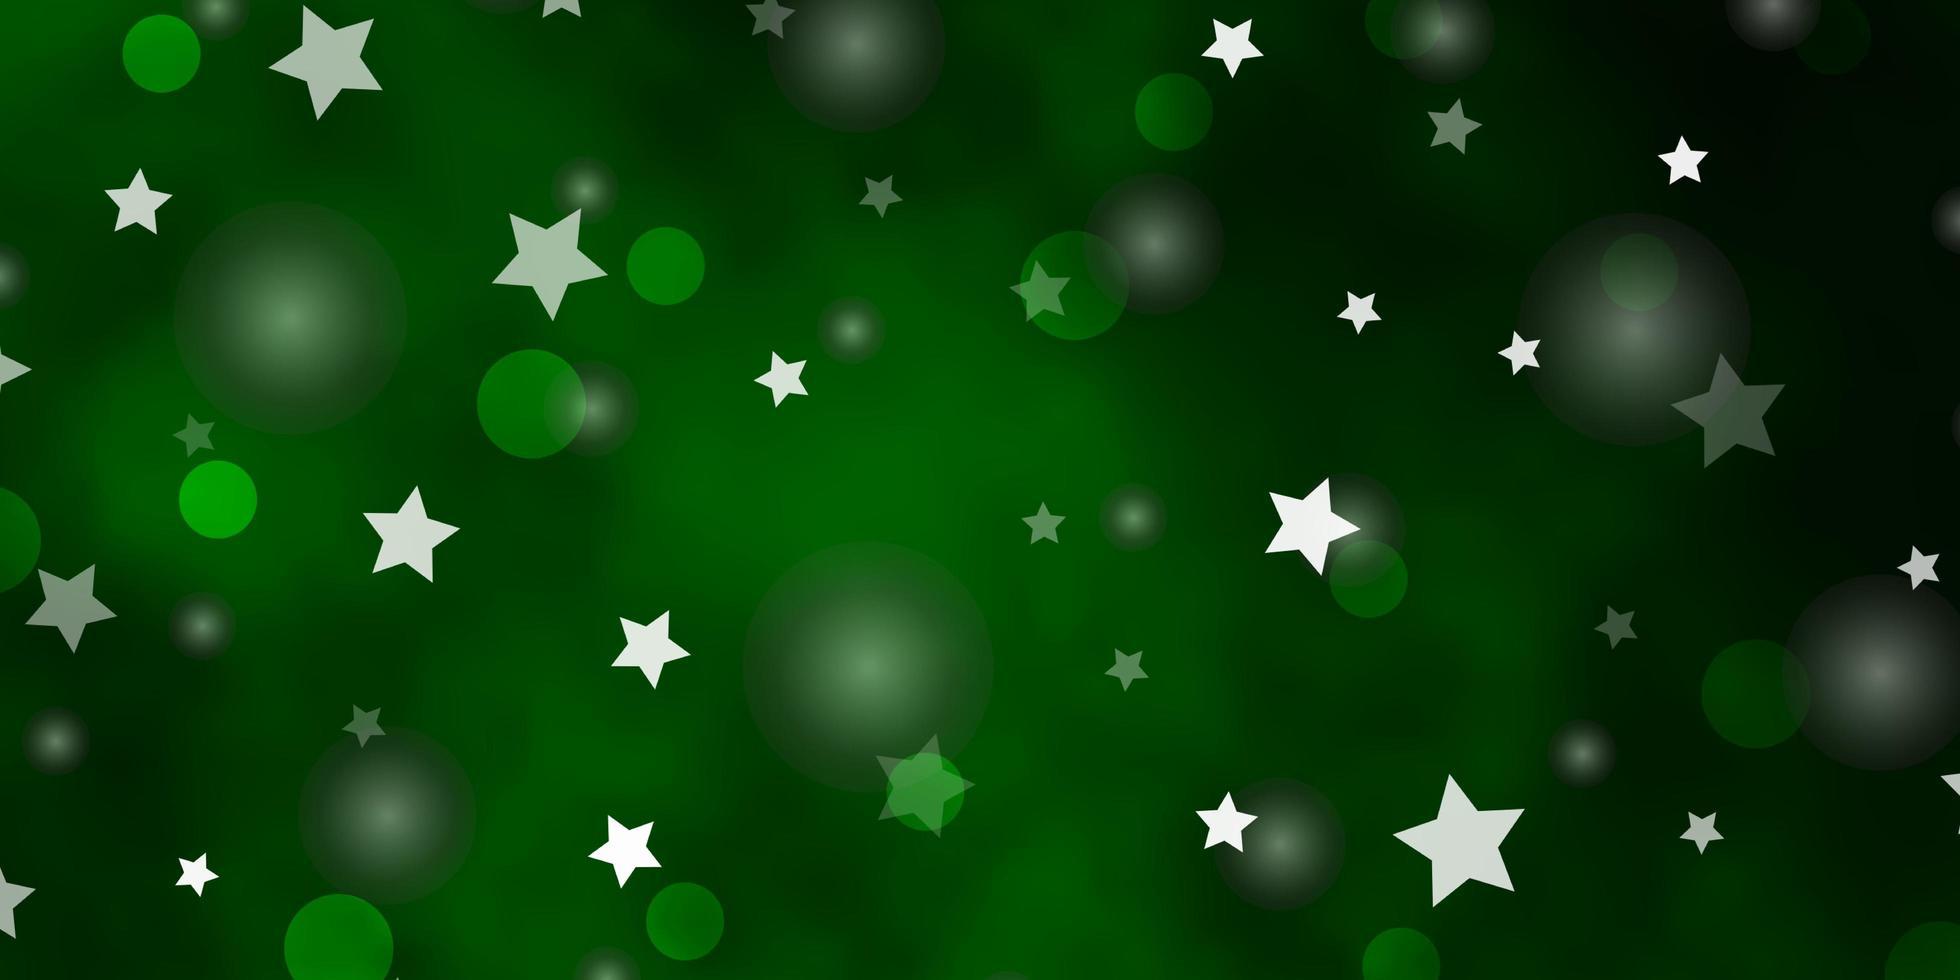 lichtgroene vector achtergrond met cirkels, sterren.